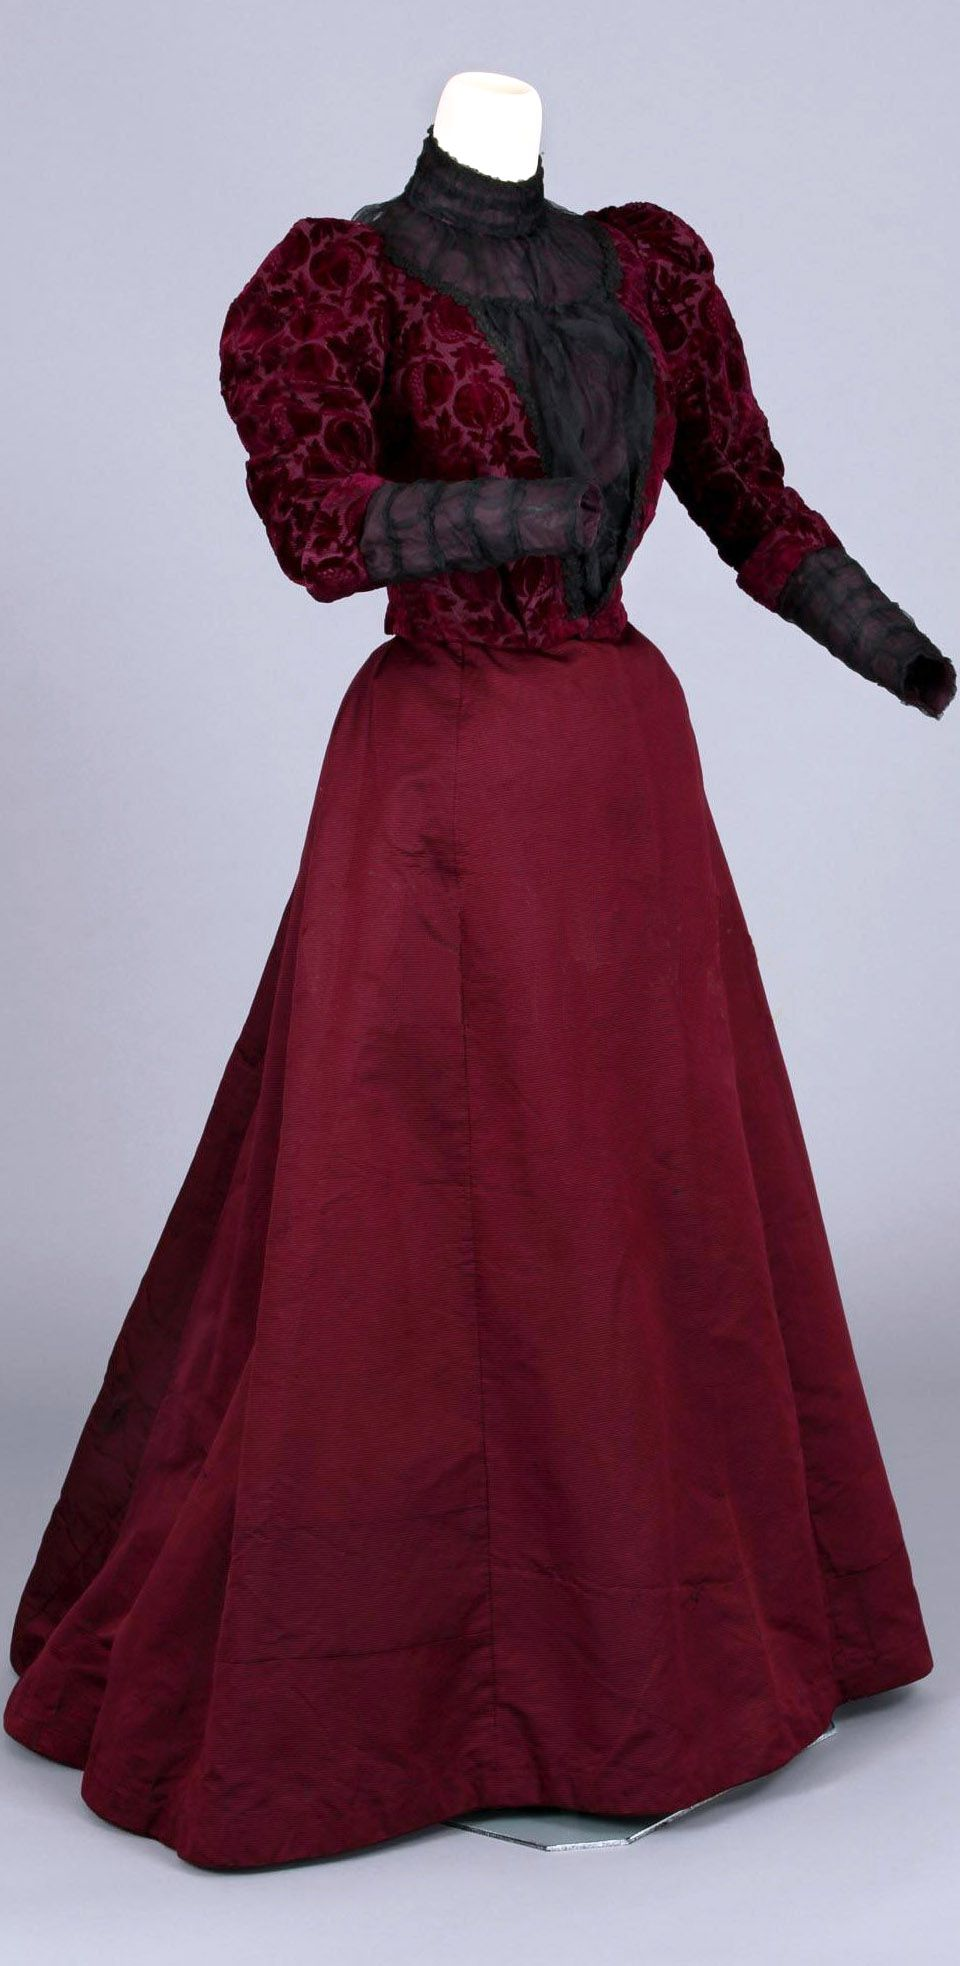 Dress Two Pieces Ca 1890 1909 Voided Velvet Black Chiffon Purple Striking Voided Velvet Pattern W Victorian Fashion Historical Dresses Edwardian Fashion [ 1966 x 960 Pixel ]